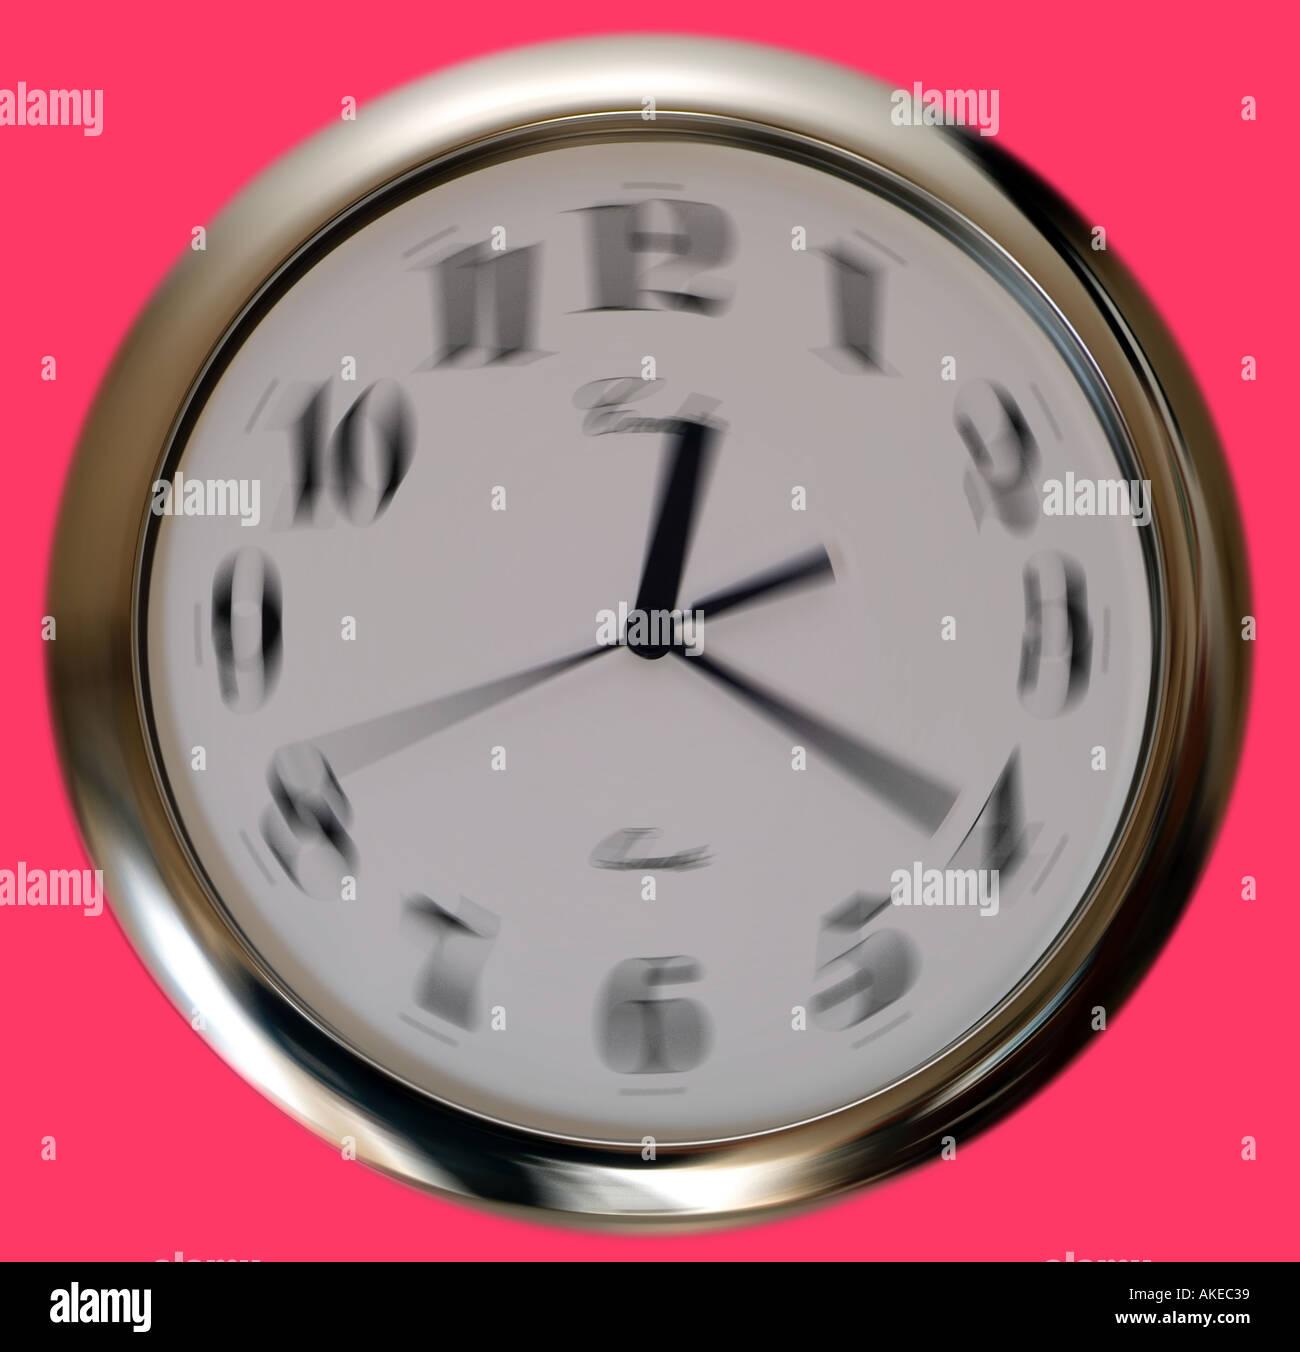 Horloge de filature Photo Stock